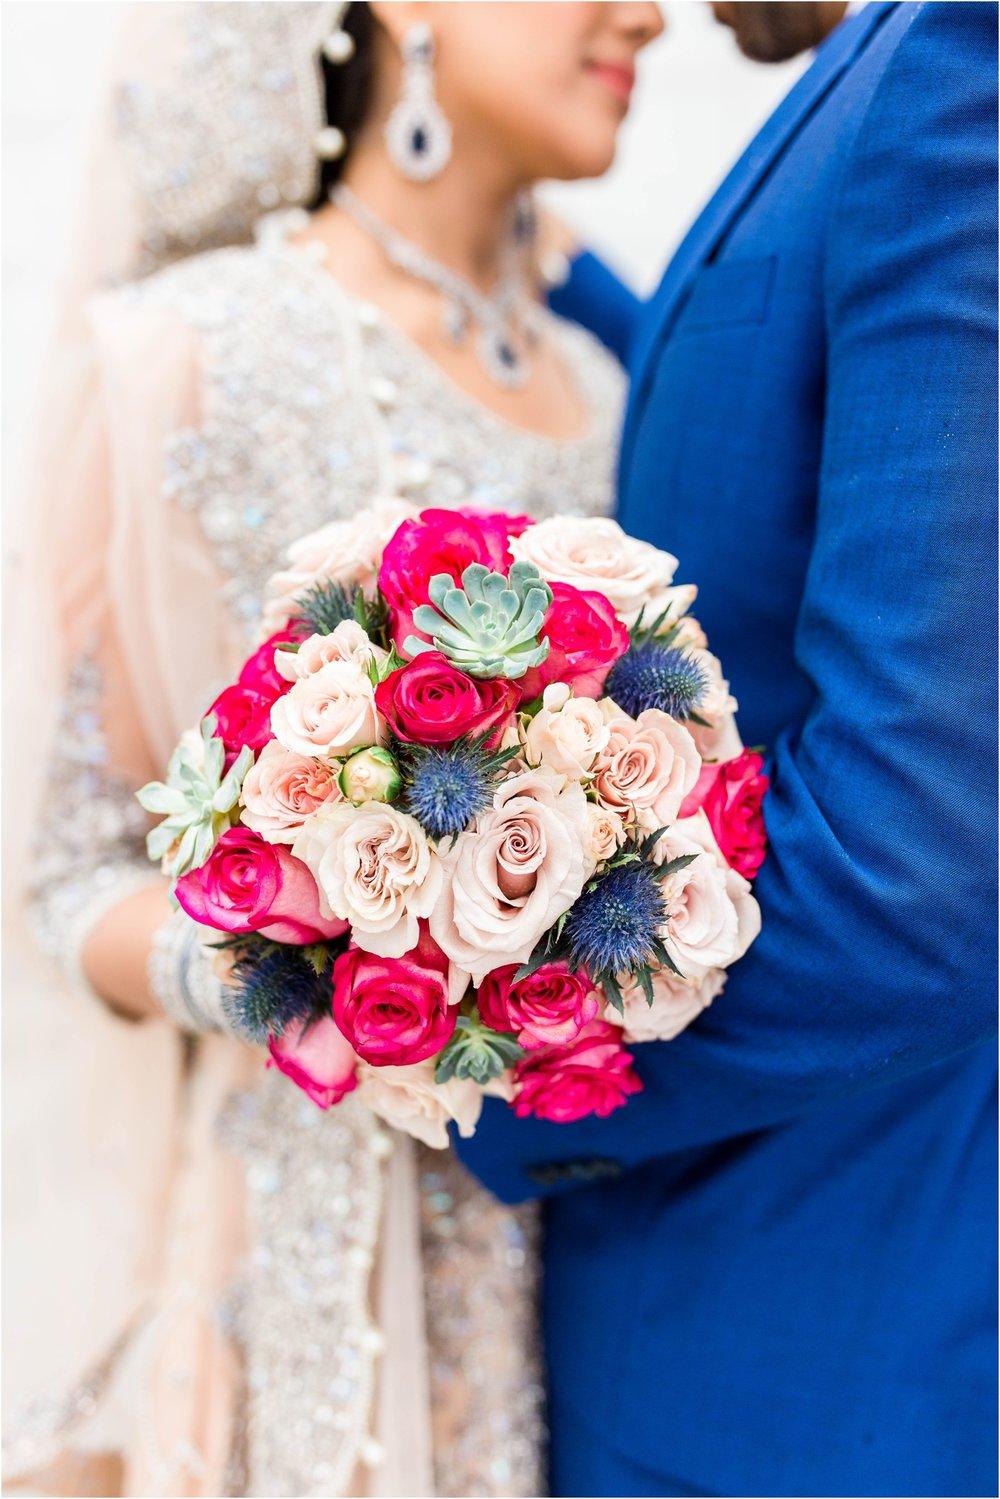 Best-of-2017-Weddings-Toronto-Mississauga-Brampton-Scarborough-GTA-Pakistani-Indian-Wedding-Engagement-Photographer-Photography_0097.jpg